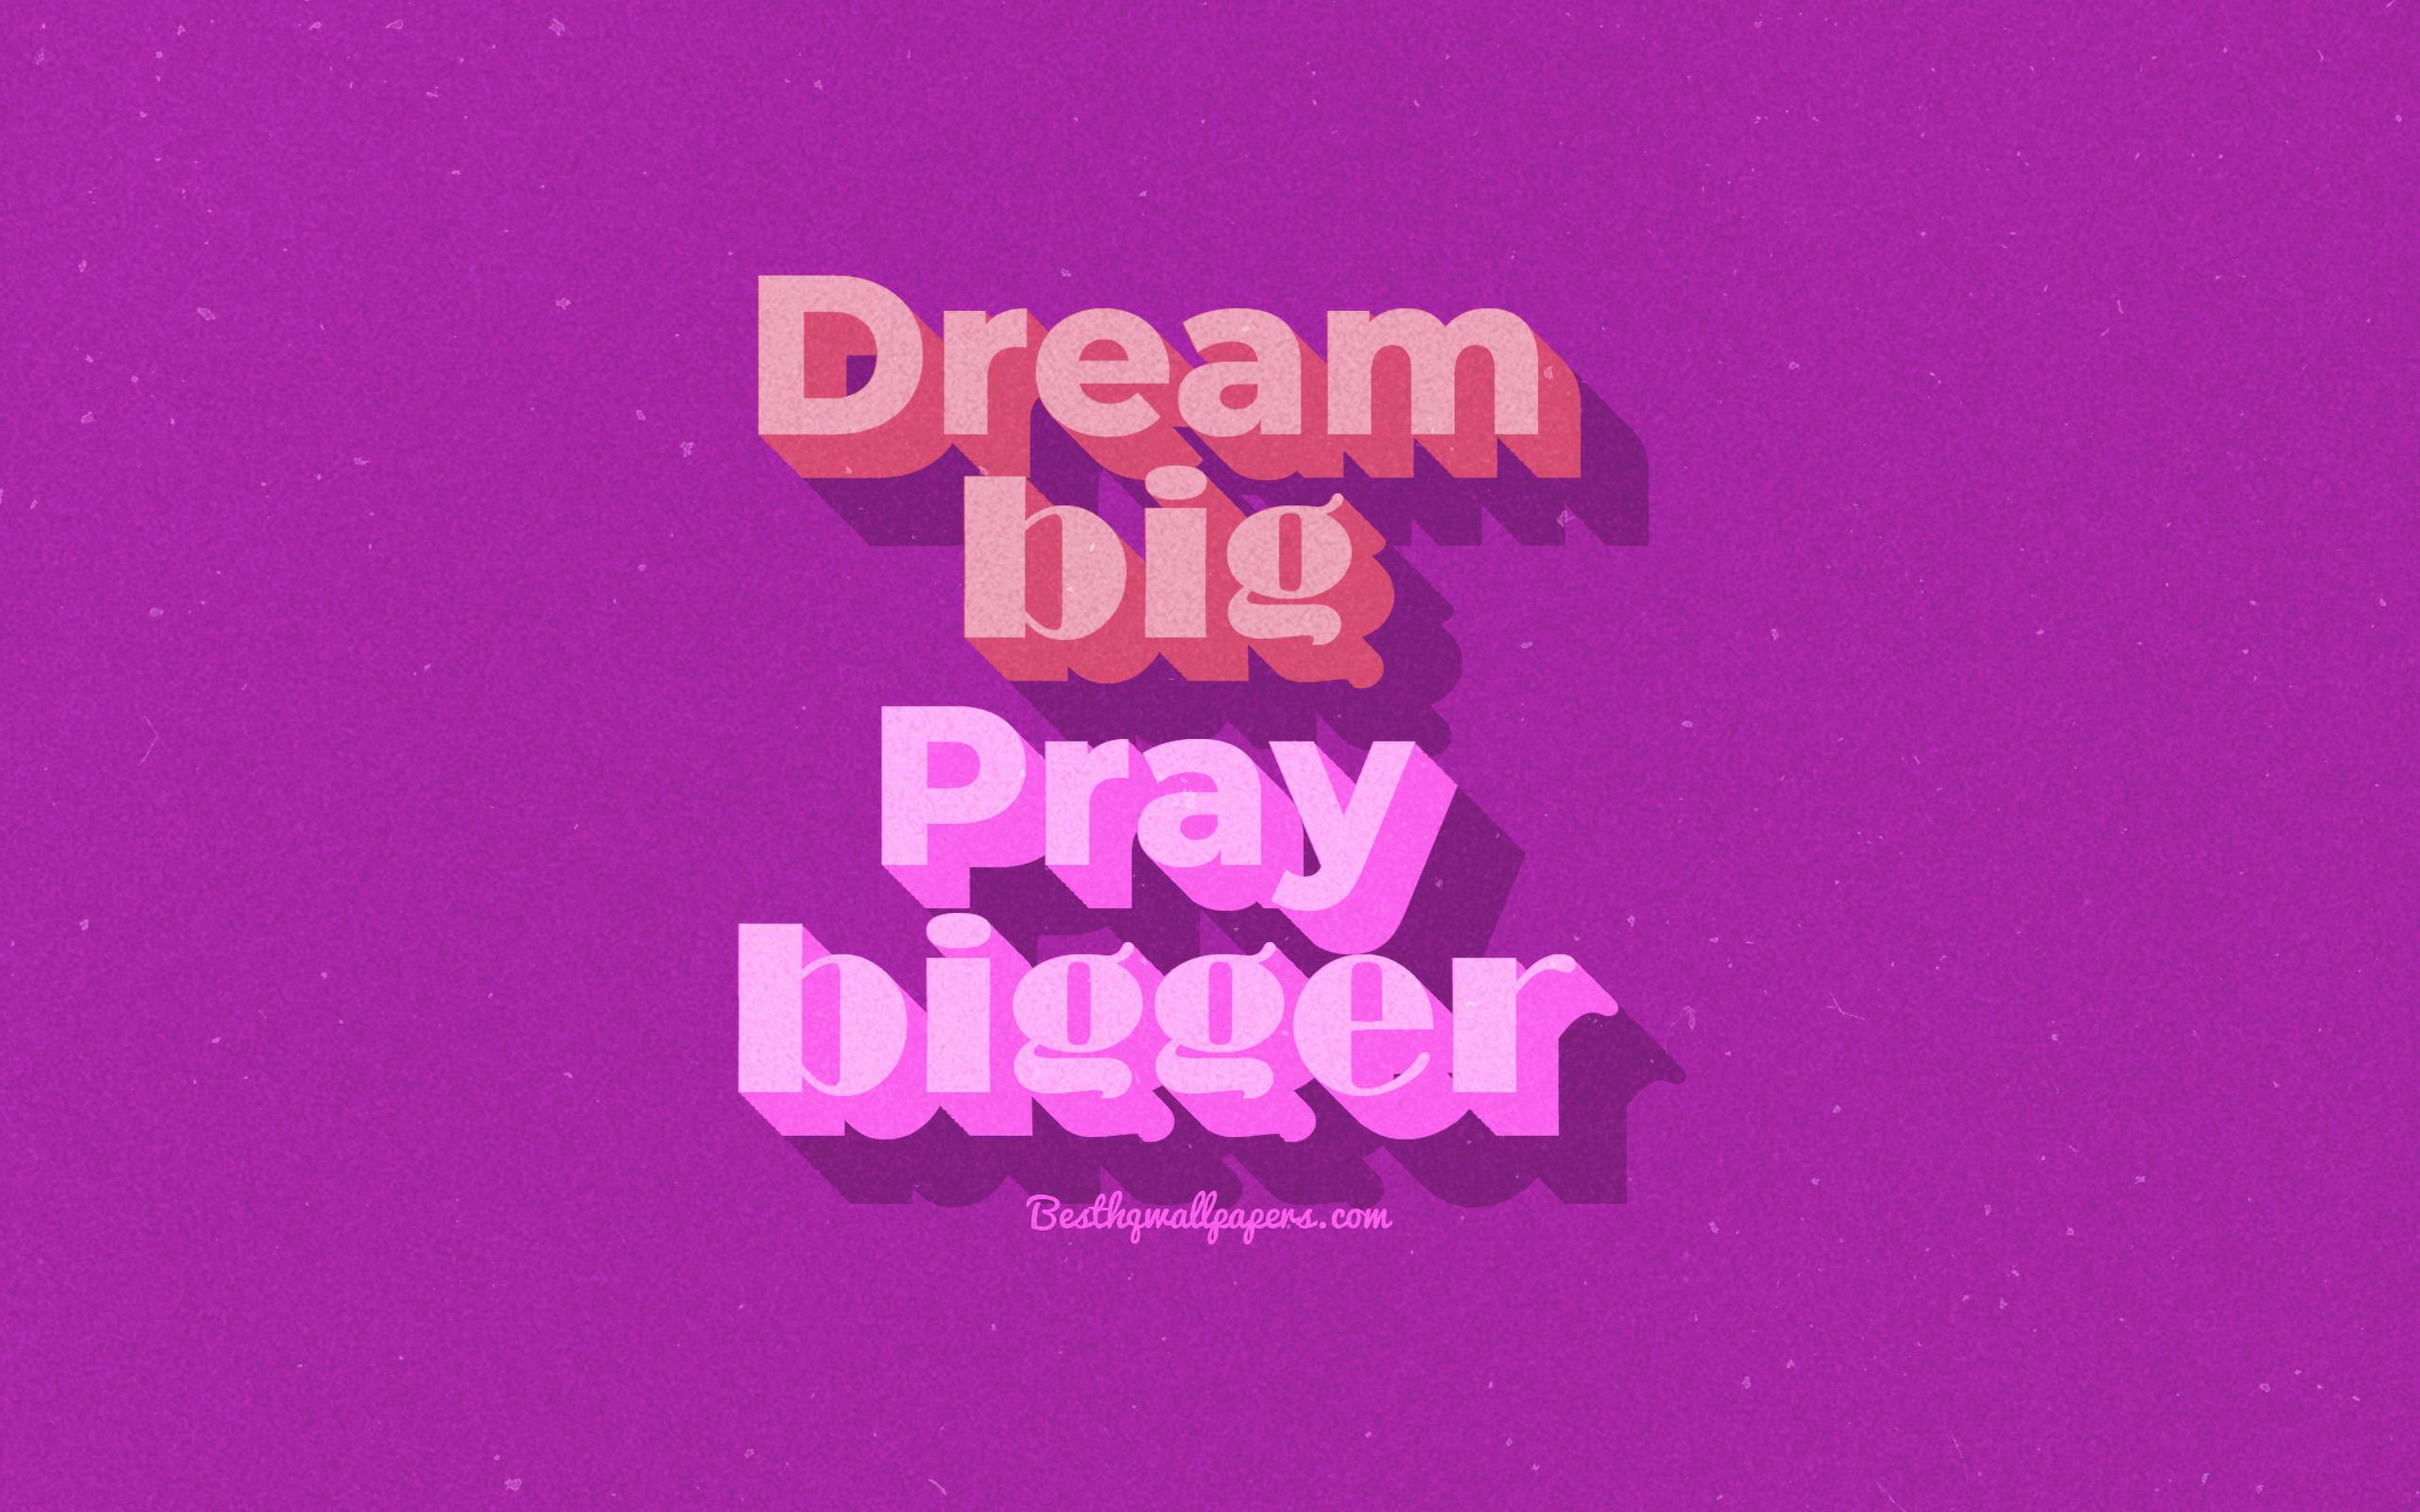 Dream Big Pray Bigger, Purple Background, Retro Text, - Poster - HD Wallpaper